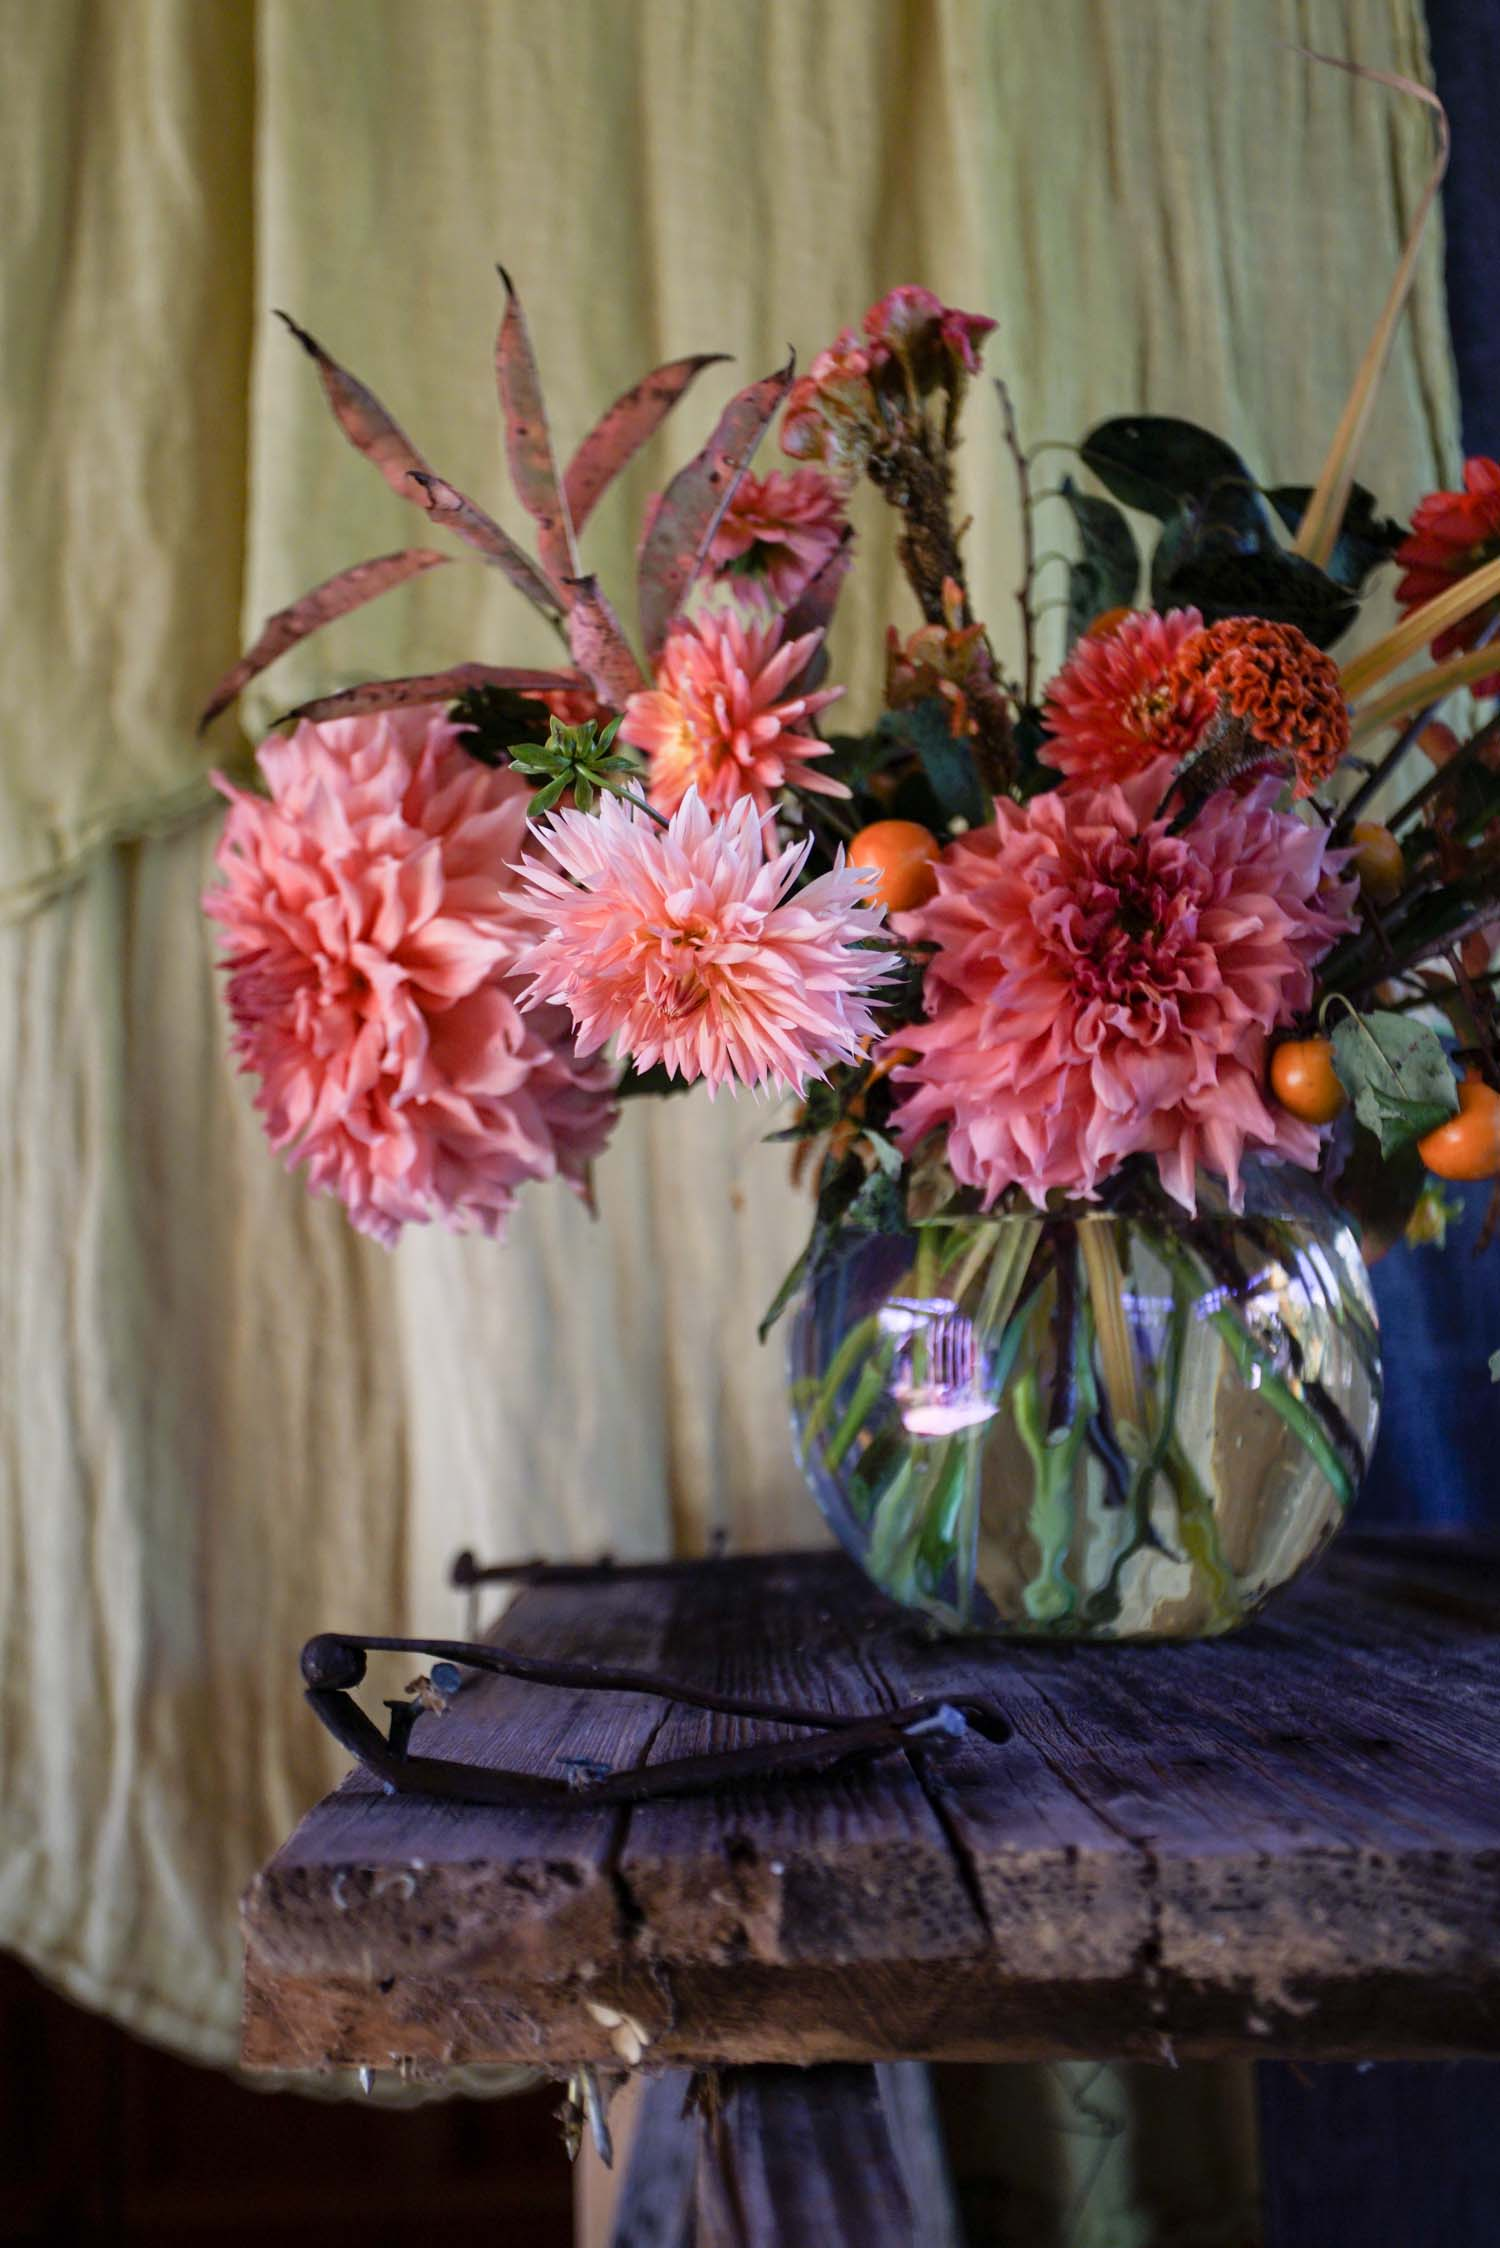 RA_3 porch farm 2016 flower social-2016101709107.jpg